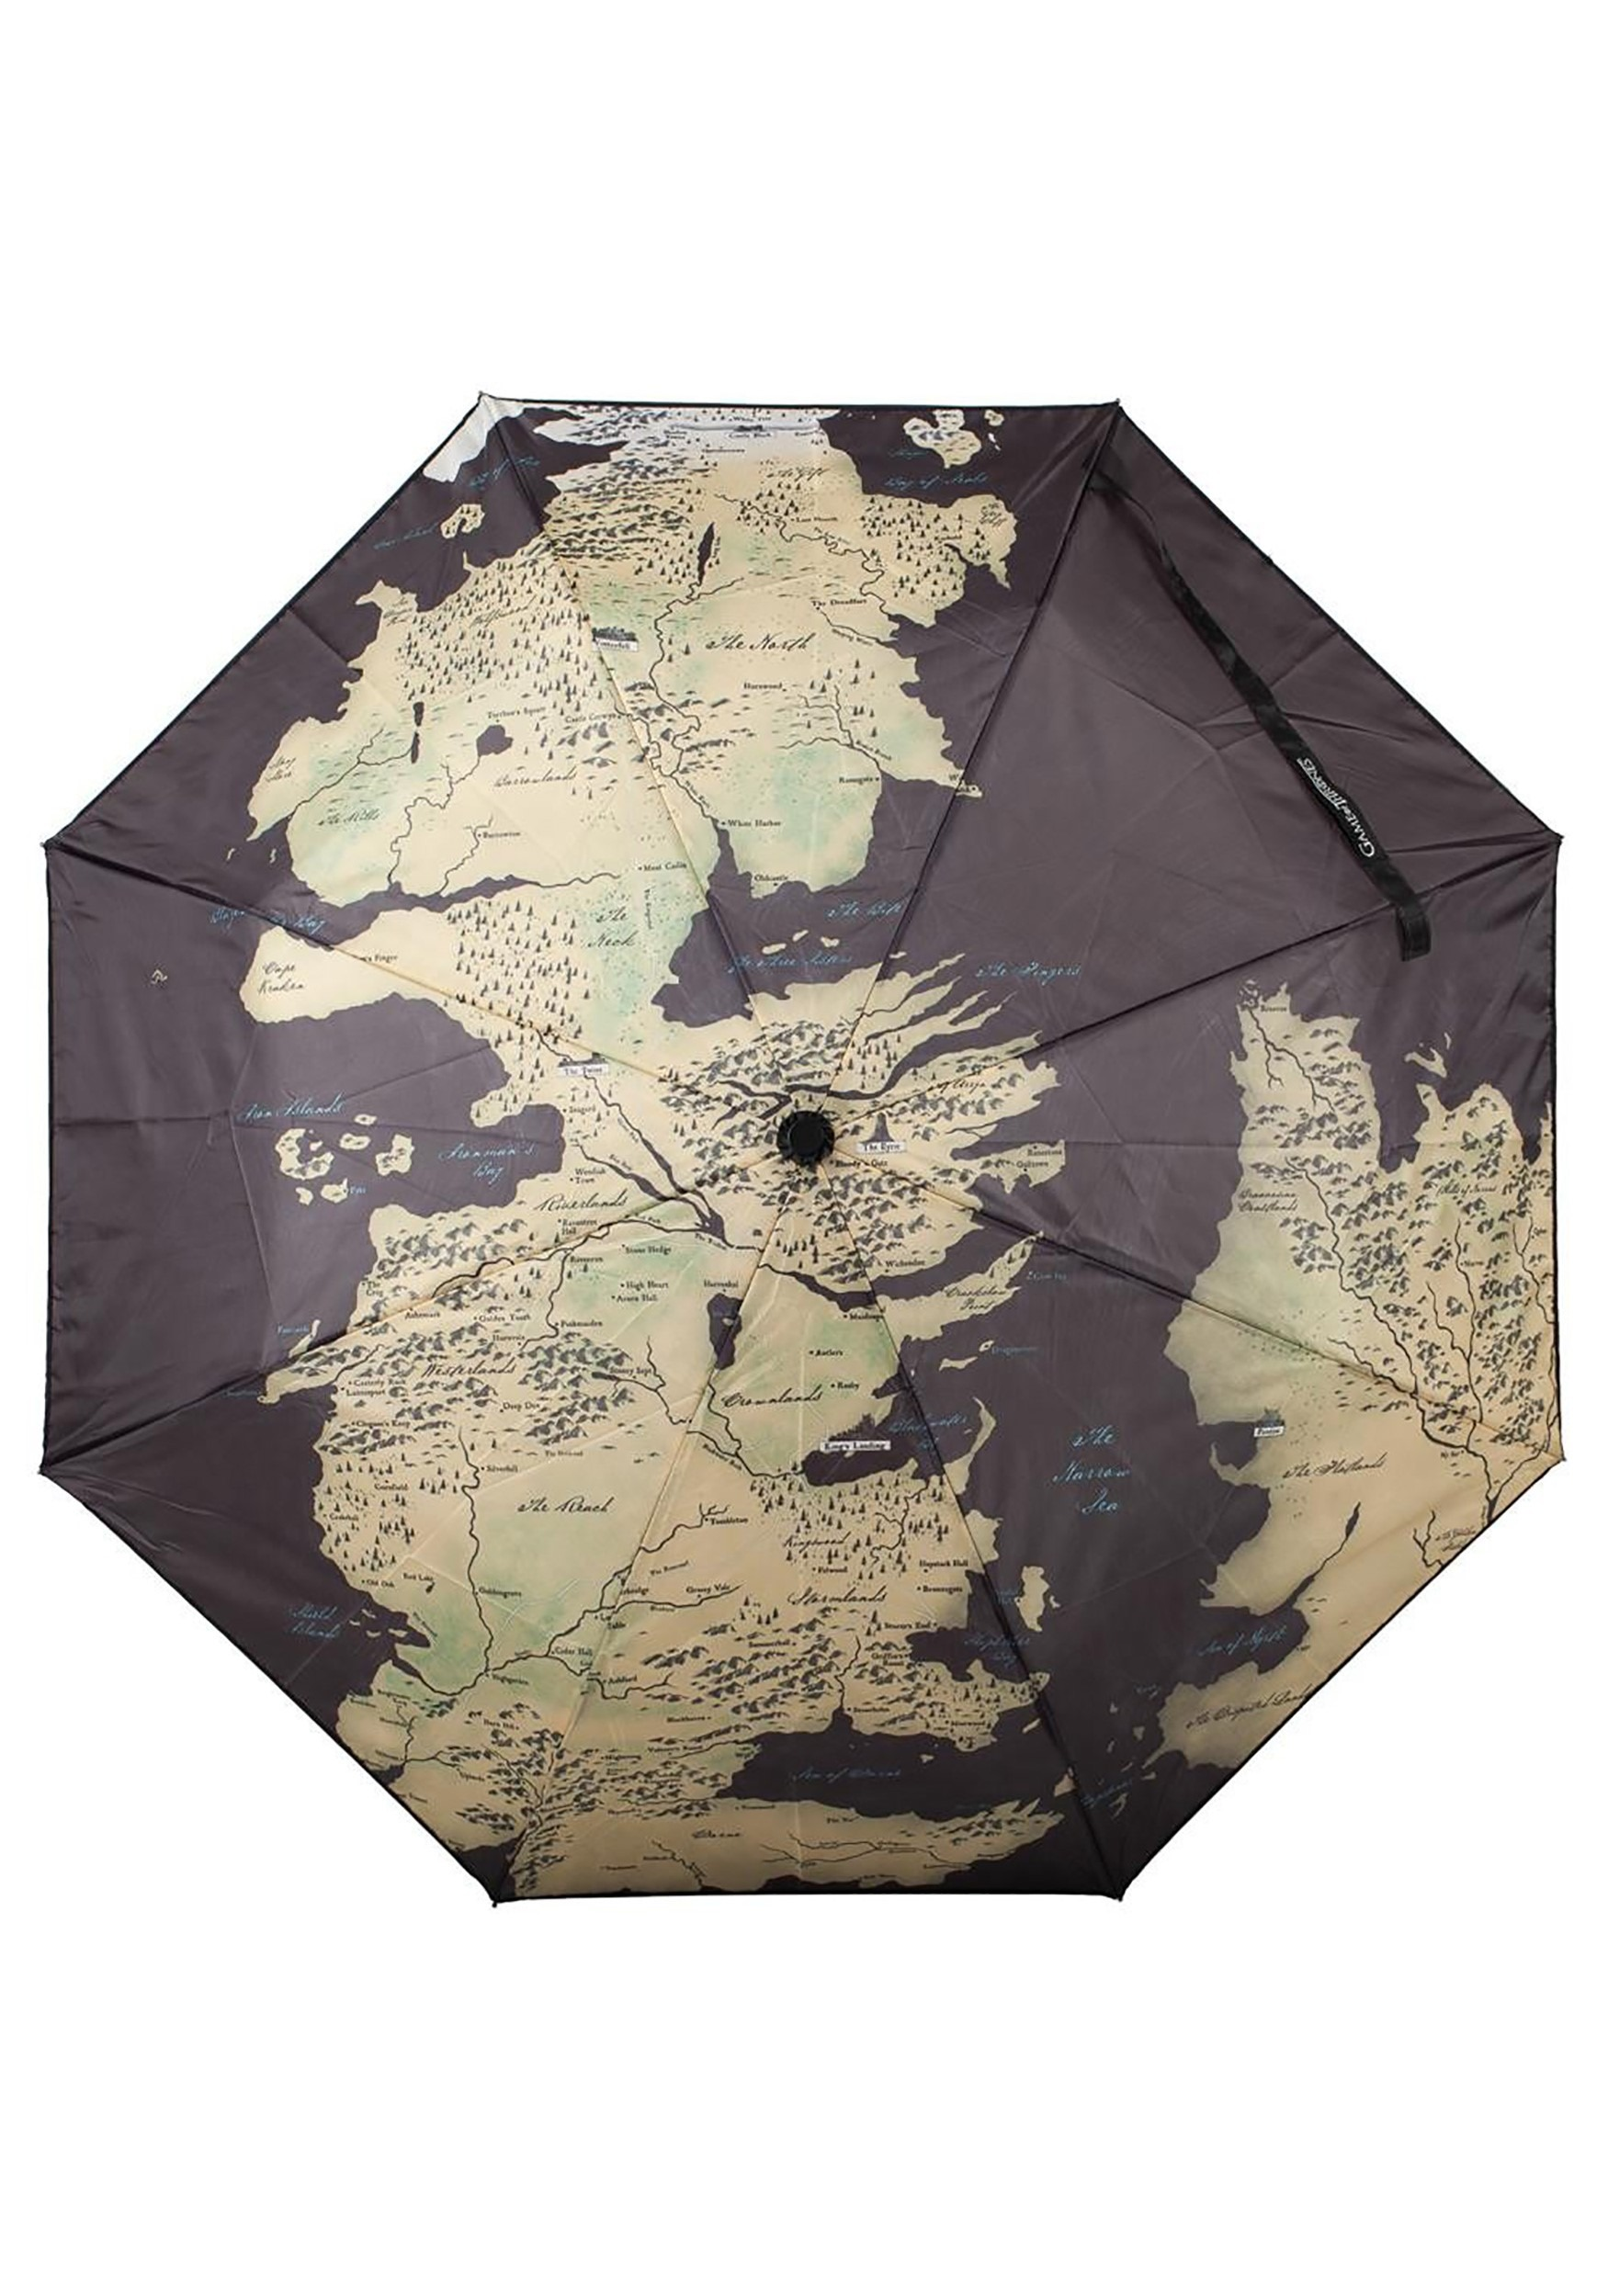 Game Of Thrones World Map Compact Black Umbrella